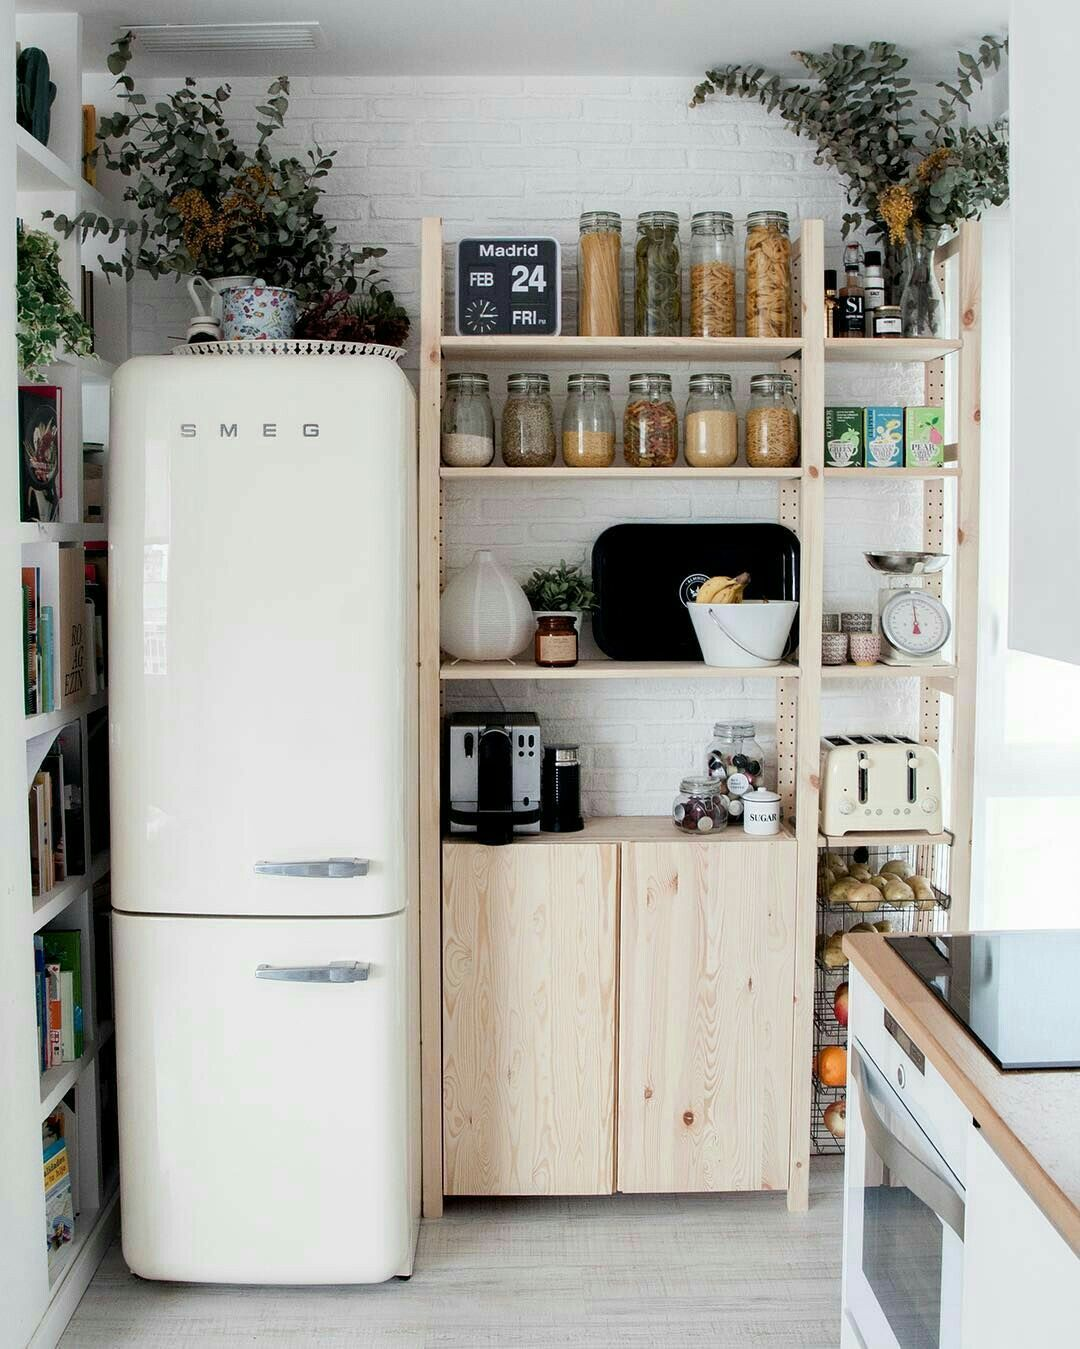 Pin by Шура Скотникова on кухня | Pinterest | Apartments, Interiors ...